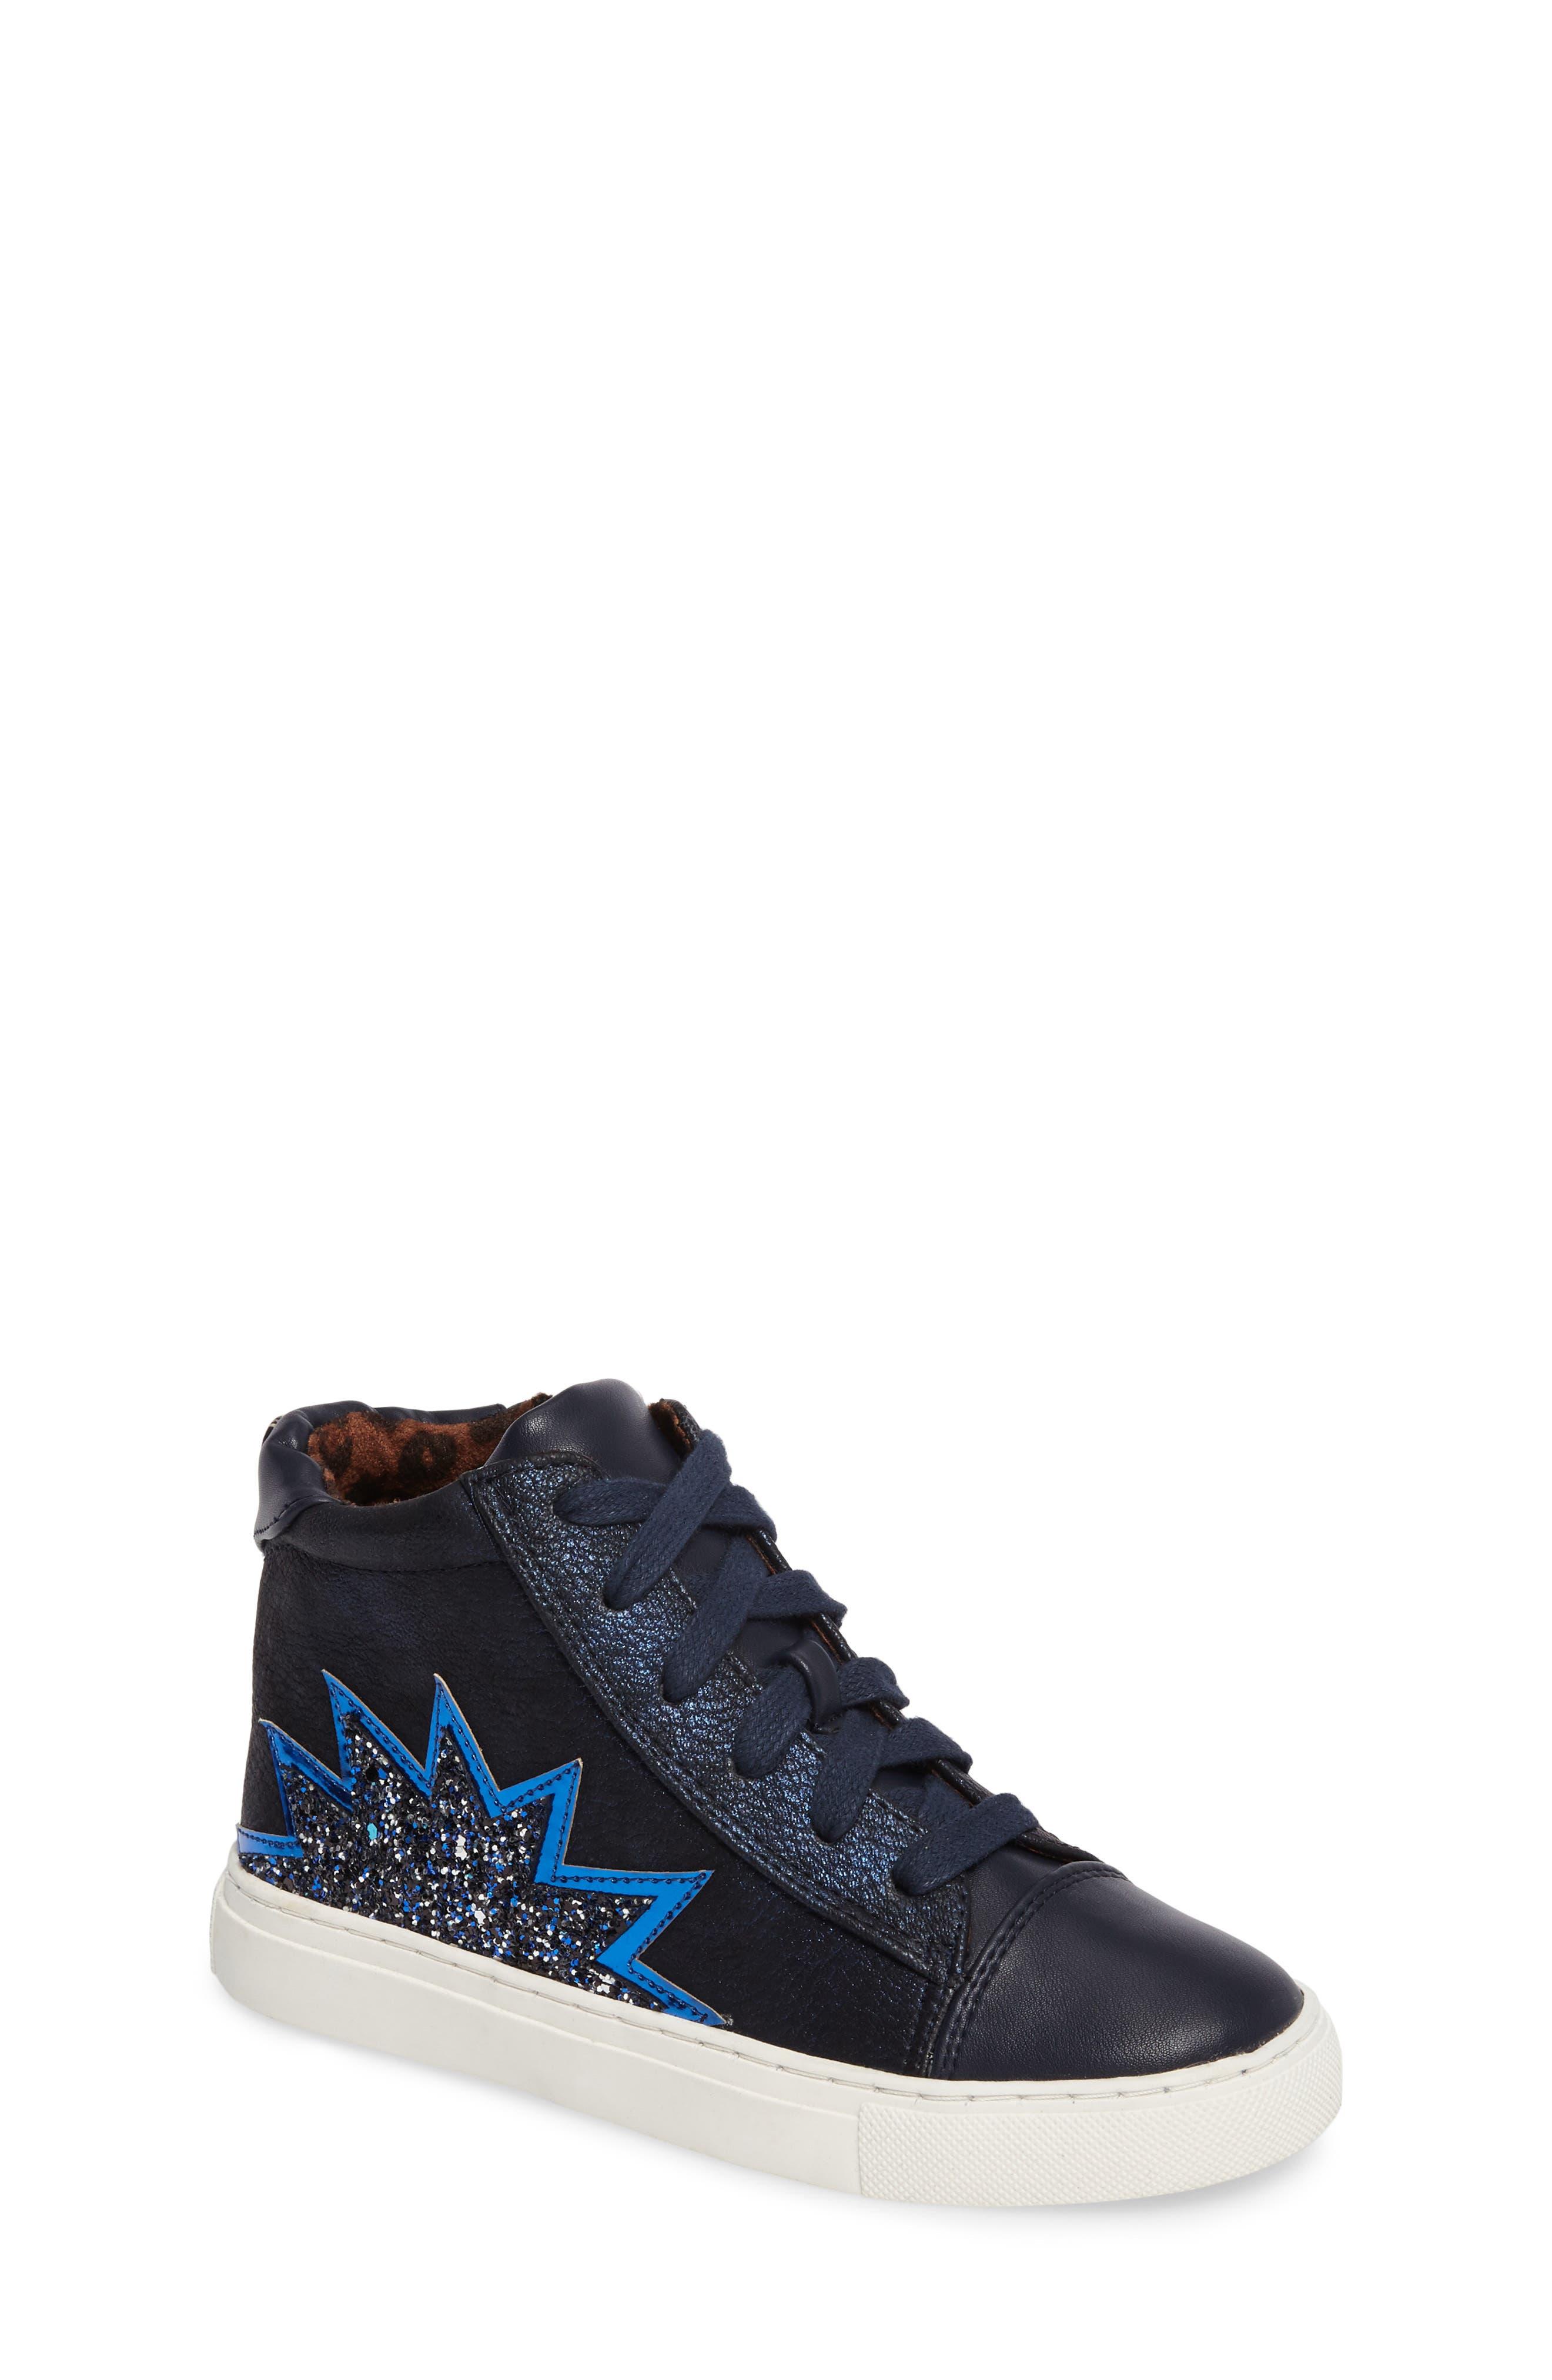 Jflash Glitter Star High Top Sneaker,                         Main,                         color, 438